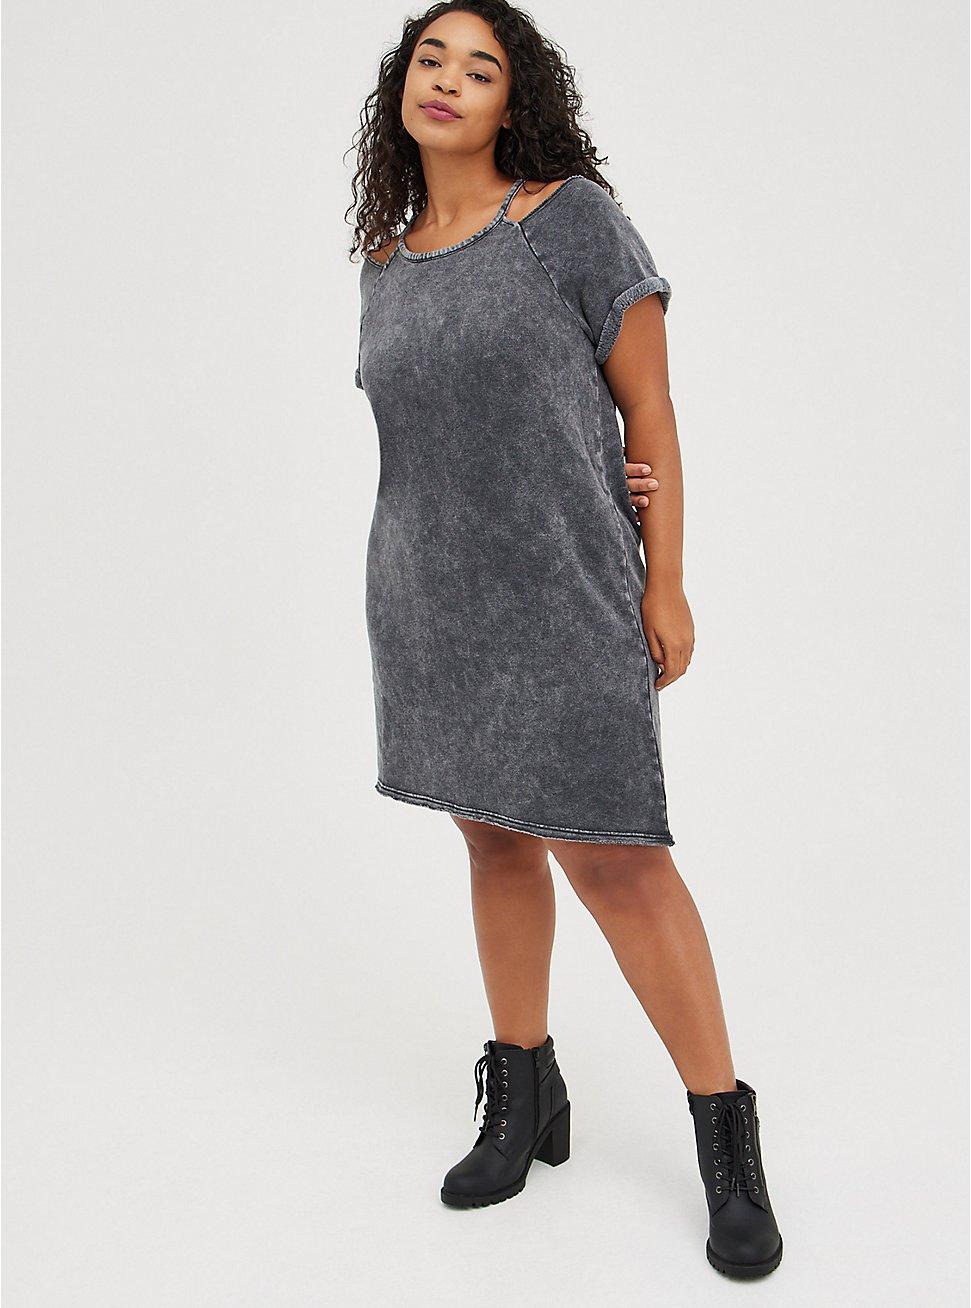 Cold Shoulder Dress - Cozy Fleece Charcoal Mineral Wash, TIE DYE - GREY, hi-res